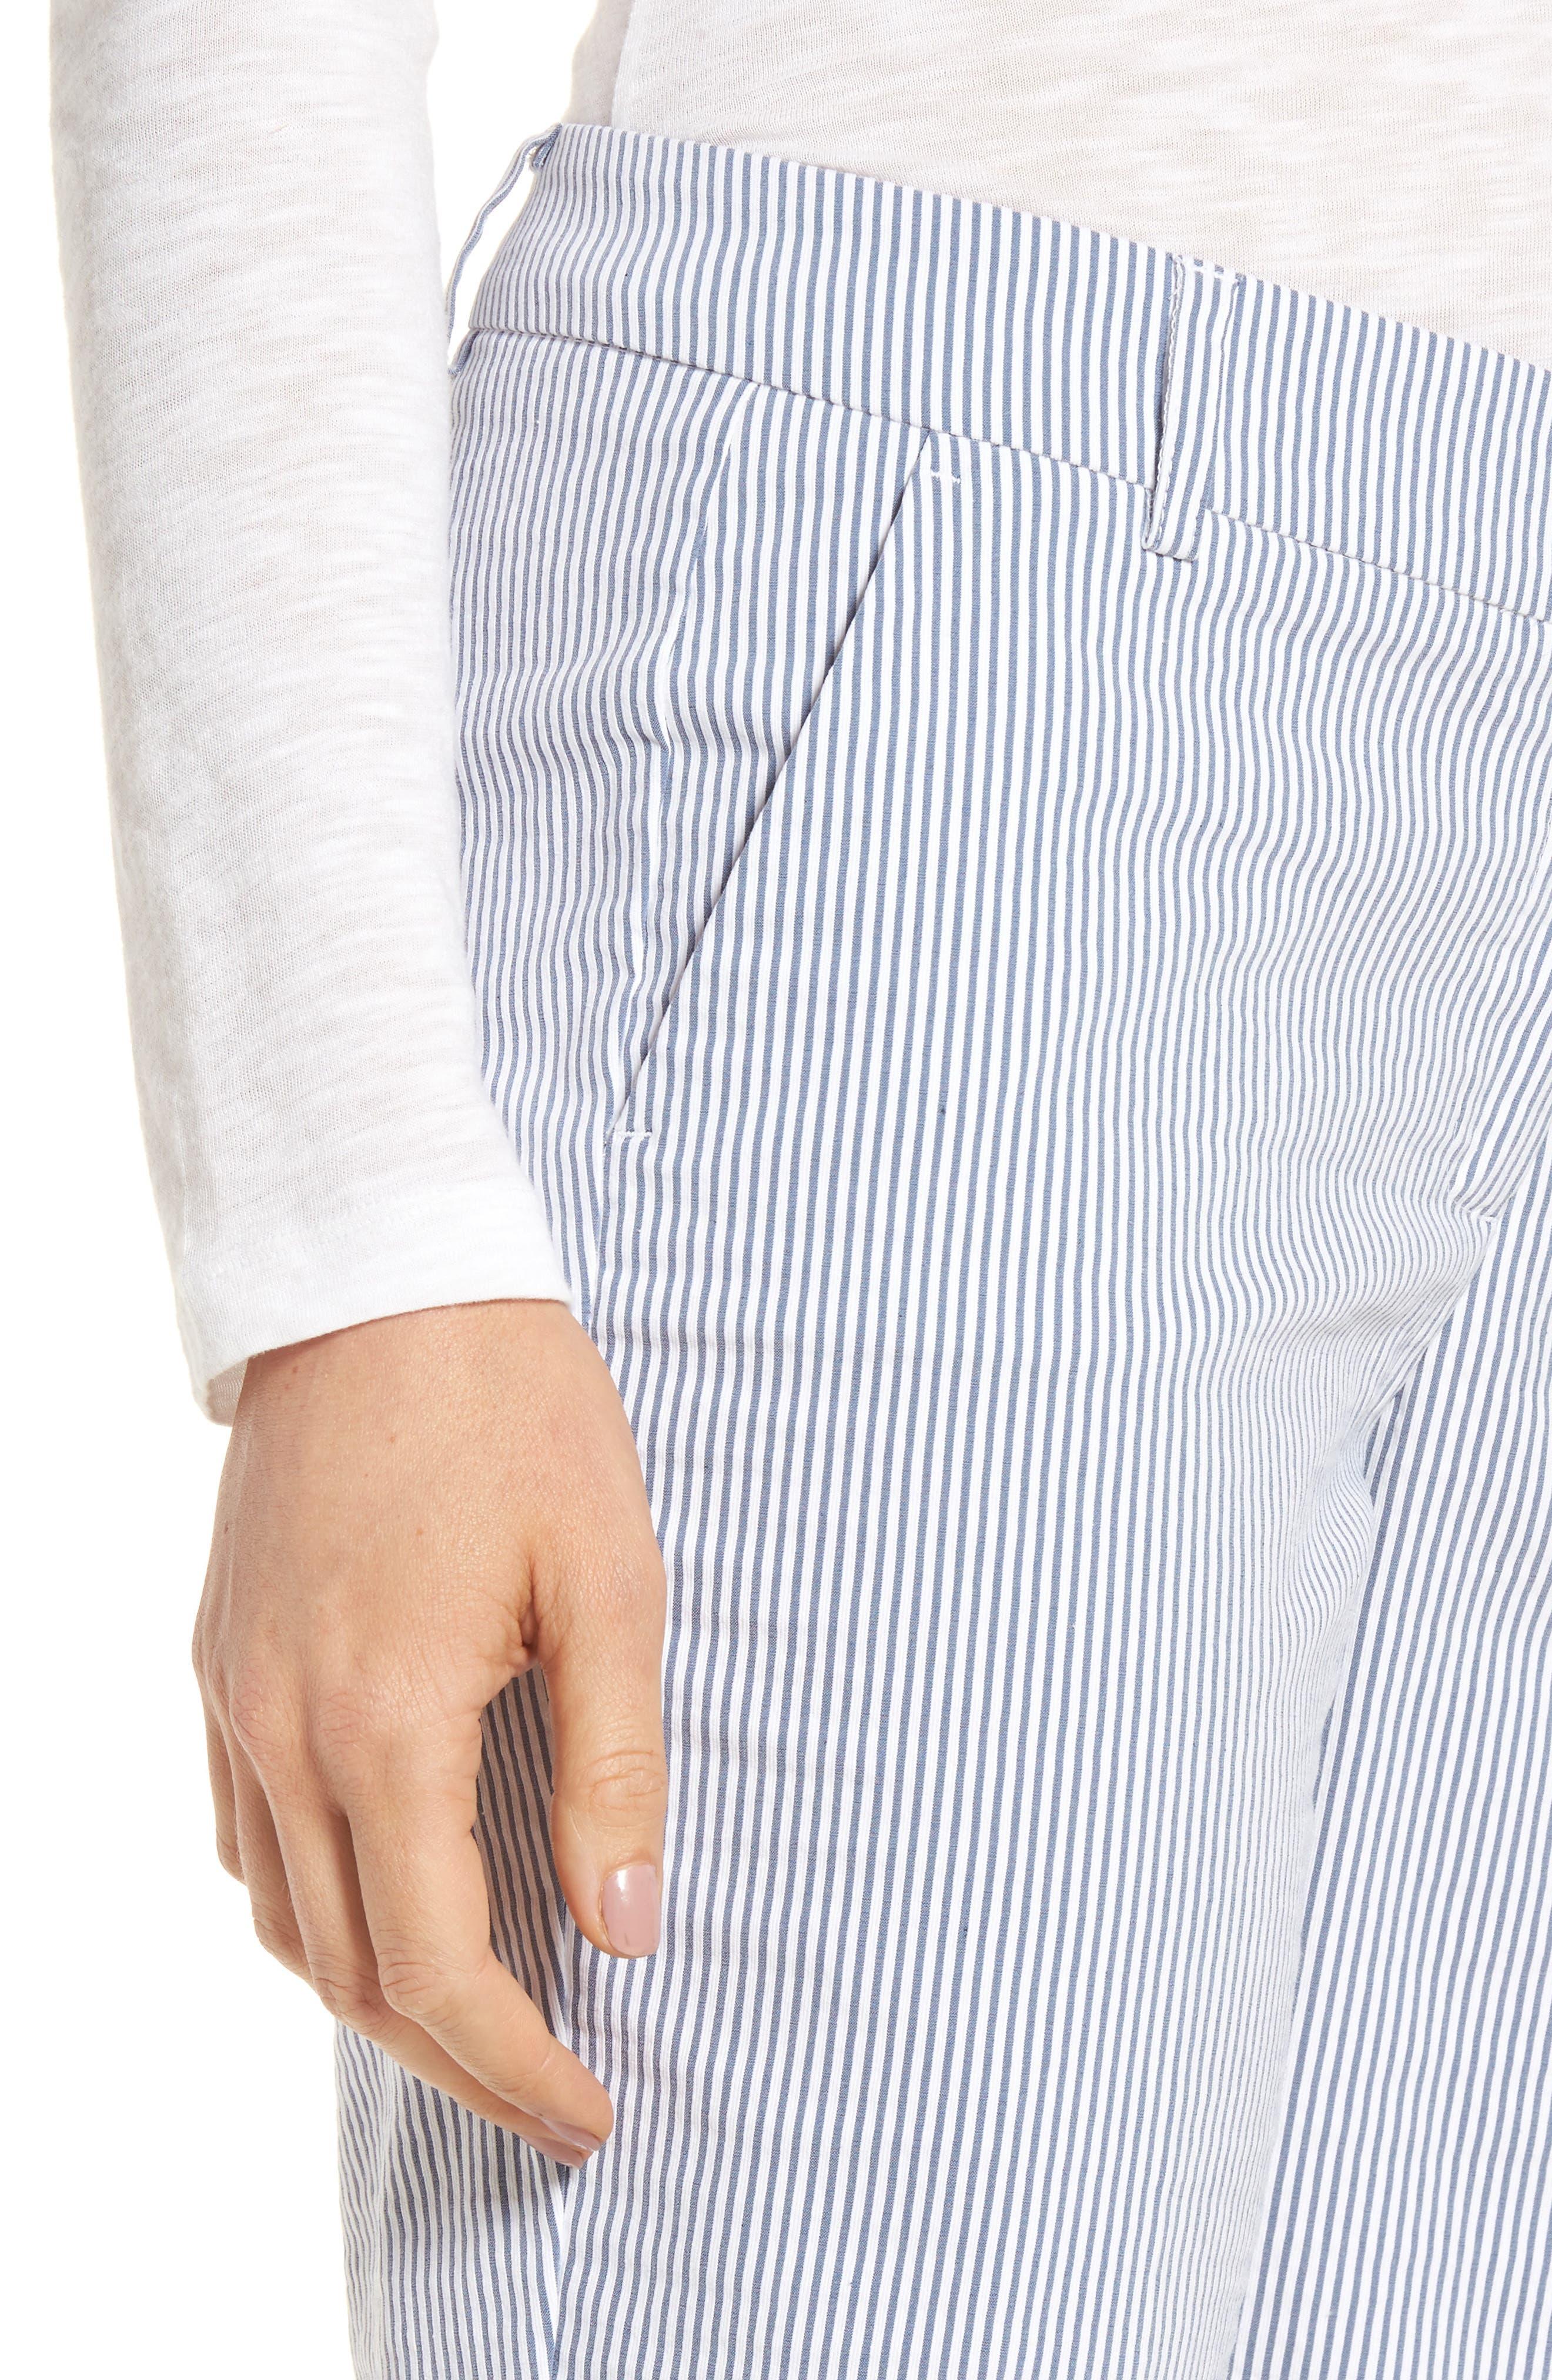 Stretch Bermuda Shorts,                             Alternate thumbnail 4, color,                             Blue- White Seersucker